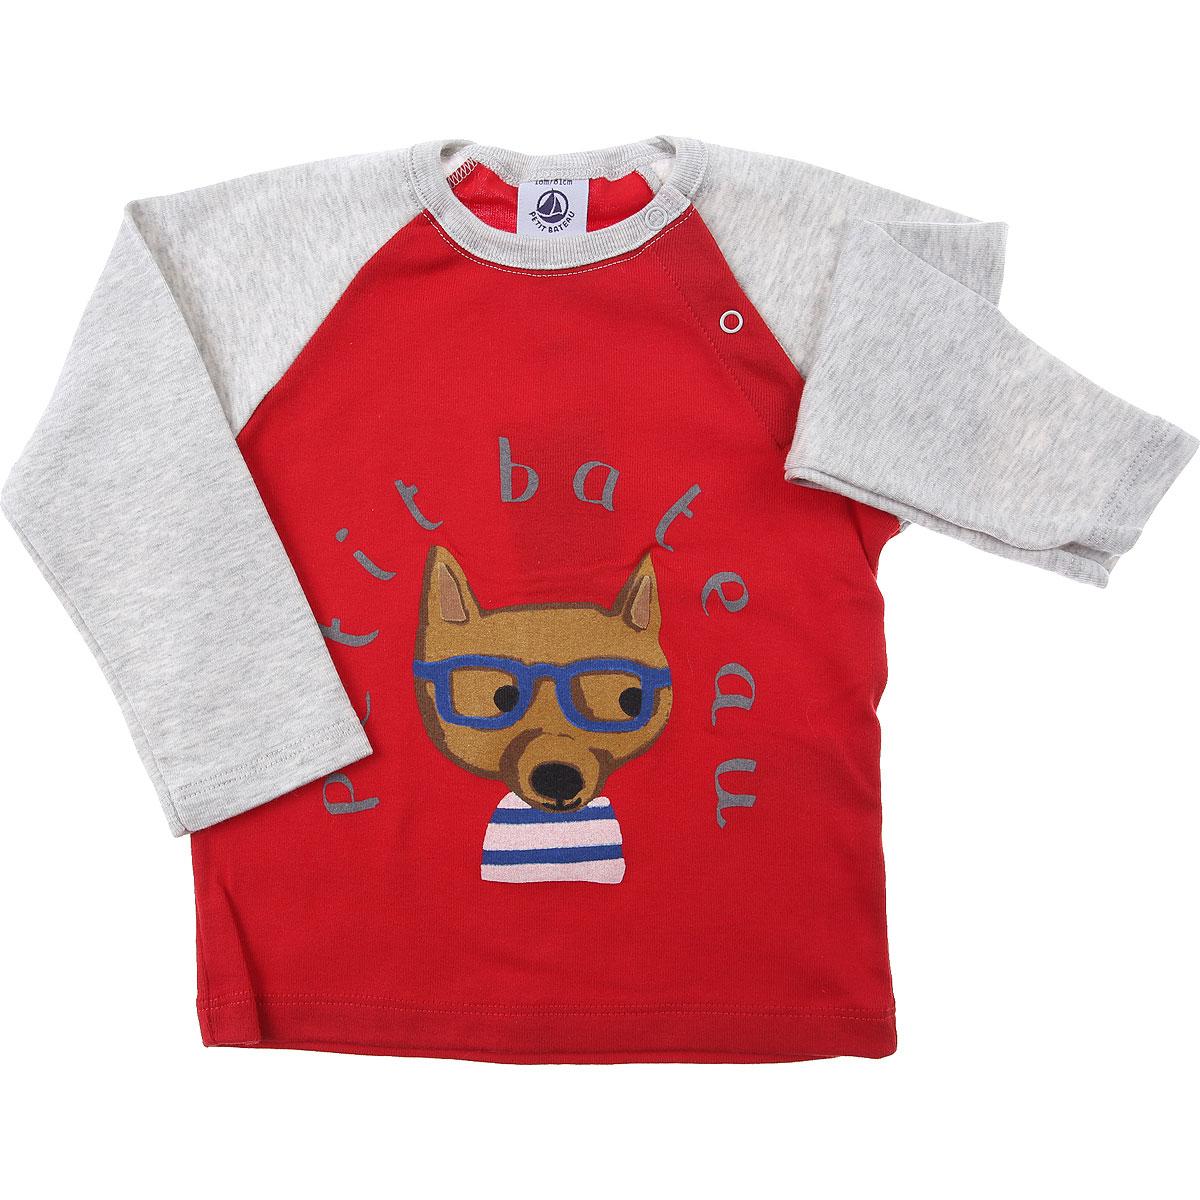 Petit Bateau Baby T-Shirt for Boys On Sale, Red, Cotton, 2019, 18M 6M